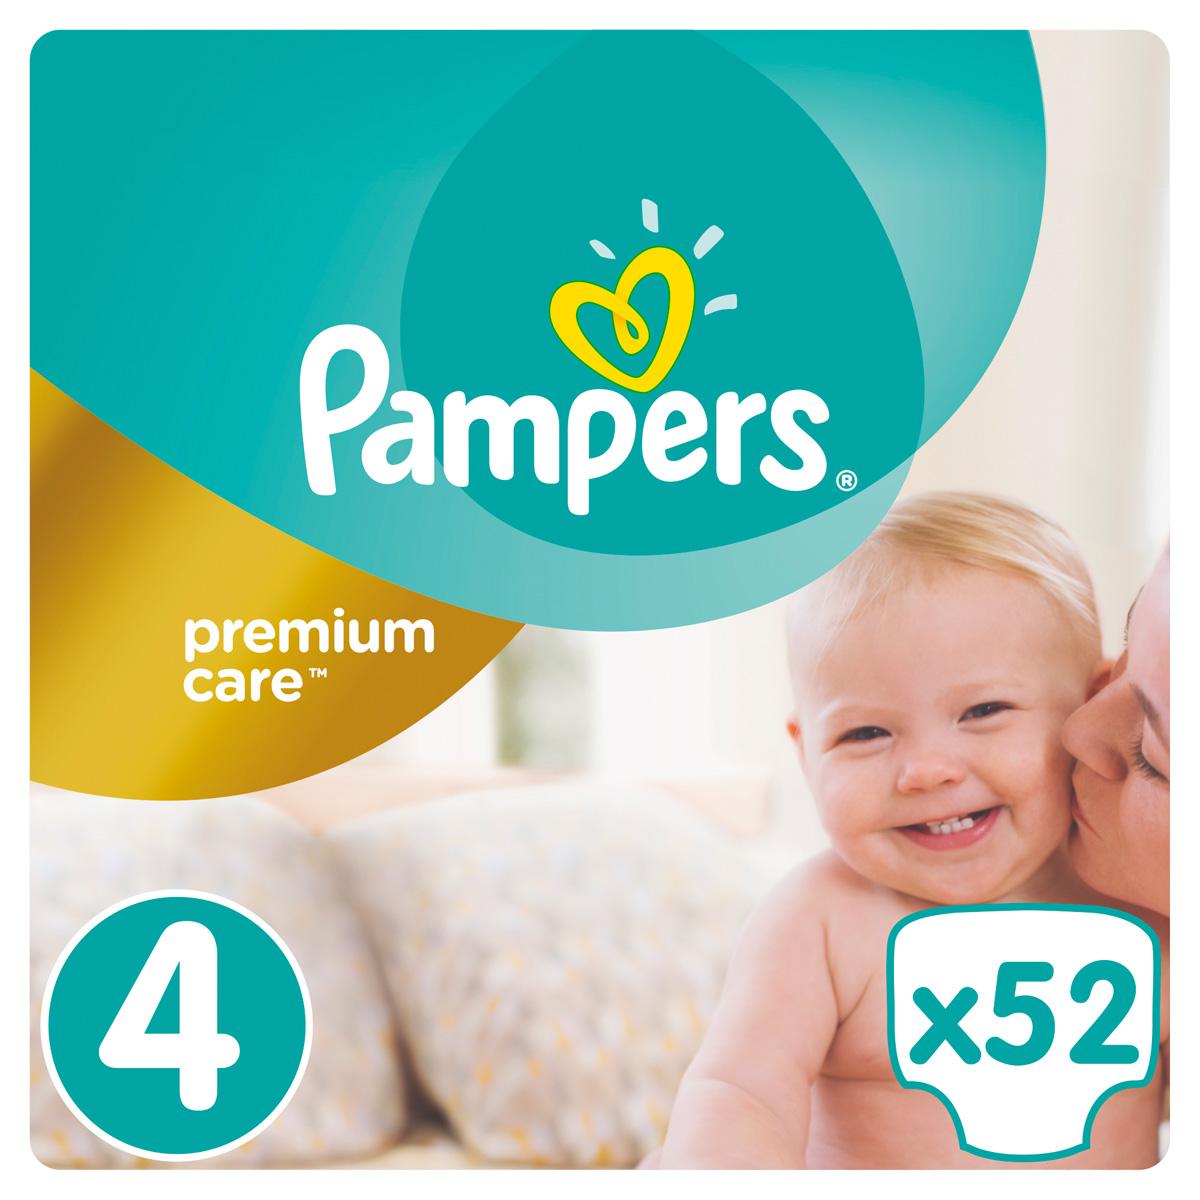 Pampers Premium Care Подгузники 4, 7-18 кг, 52 шт подгузники детские pampers подгузники pampers premium care 2 5 кг 1 размер 88 шт